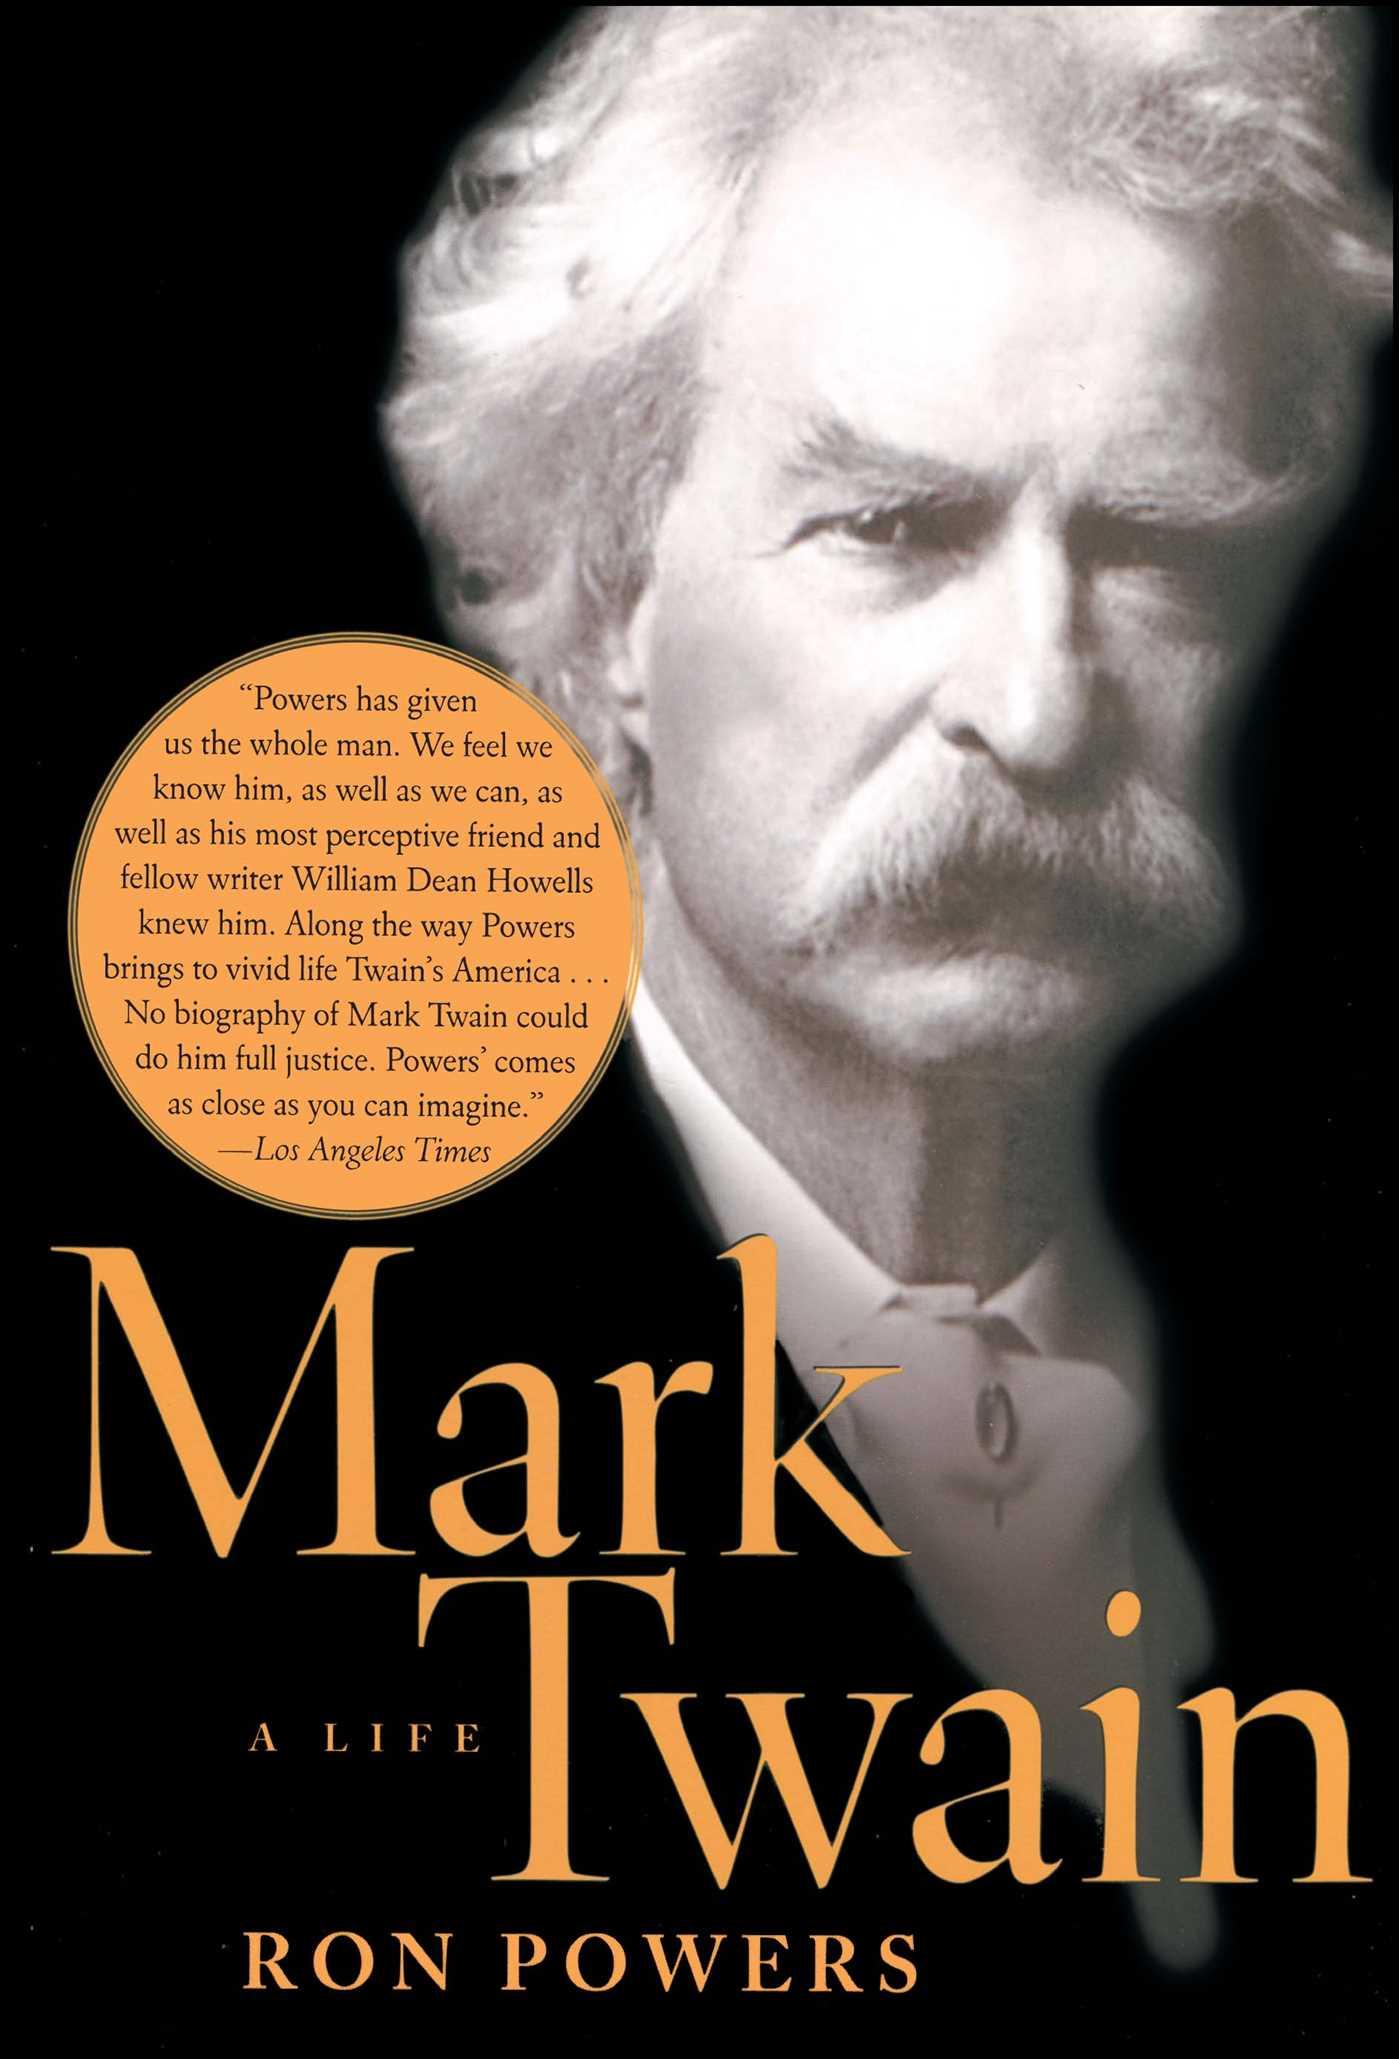 biography of mark twain pdf